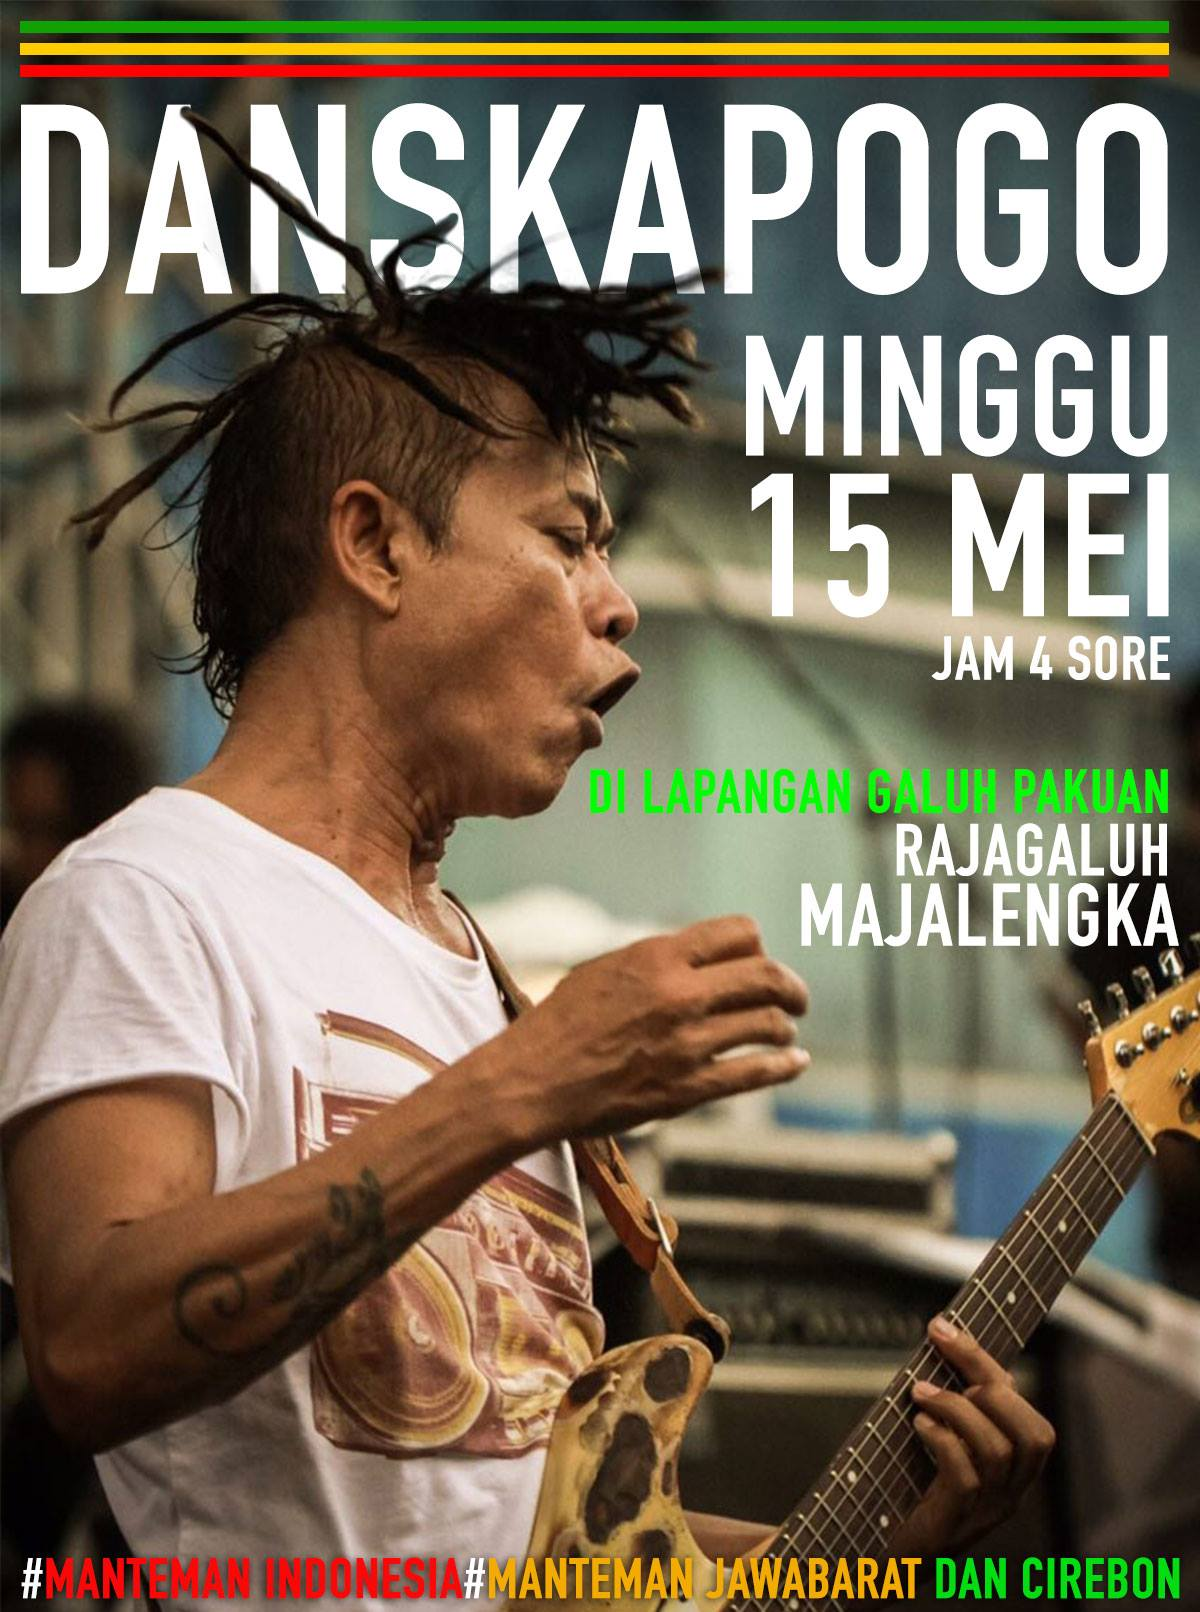 Tony Q Rastafara - Konser Rajagaluh Majalengka